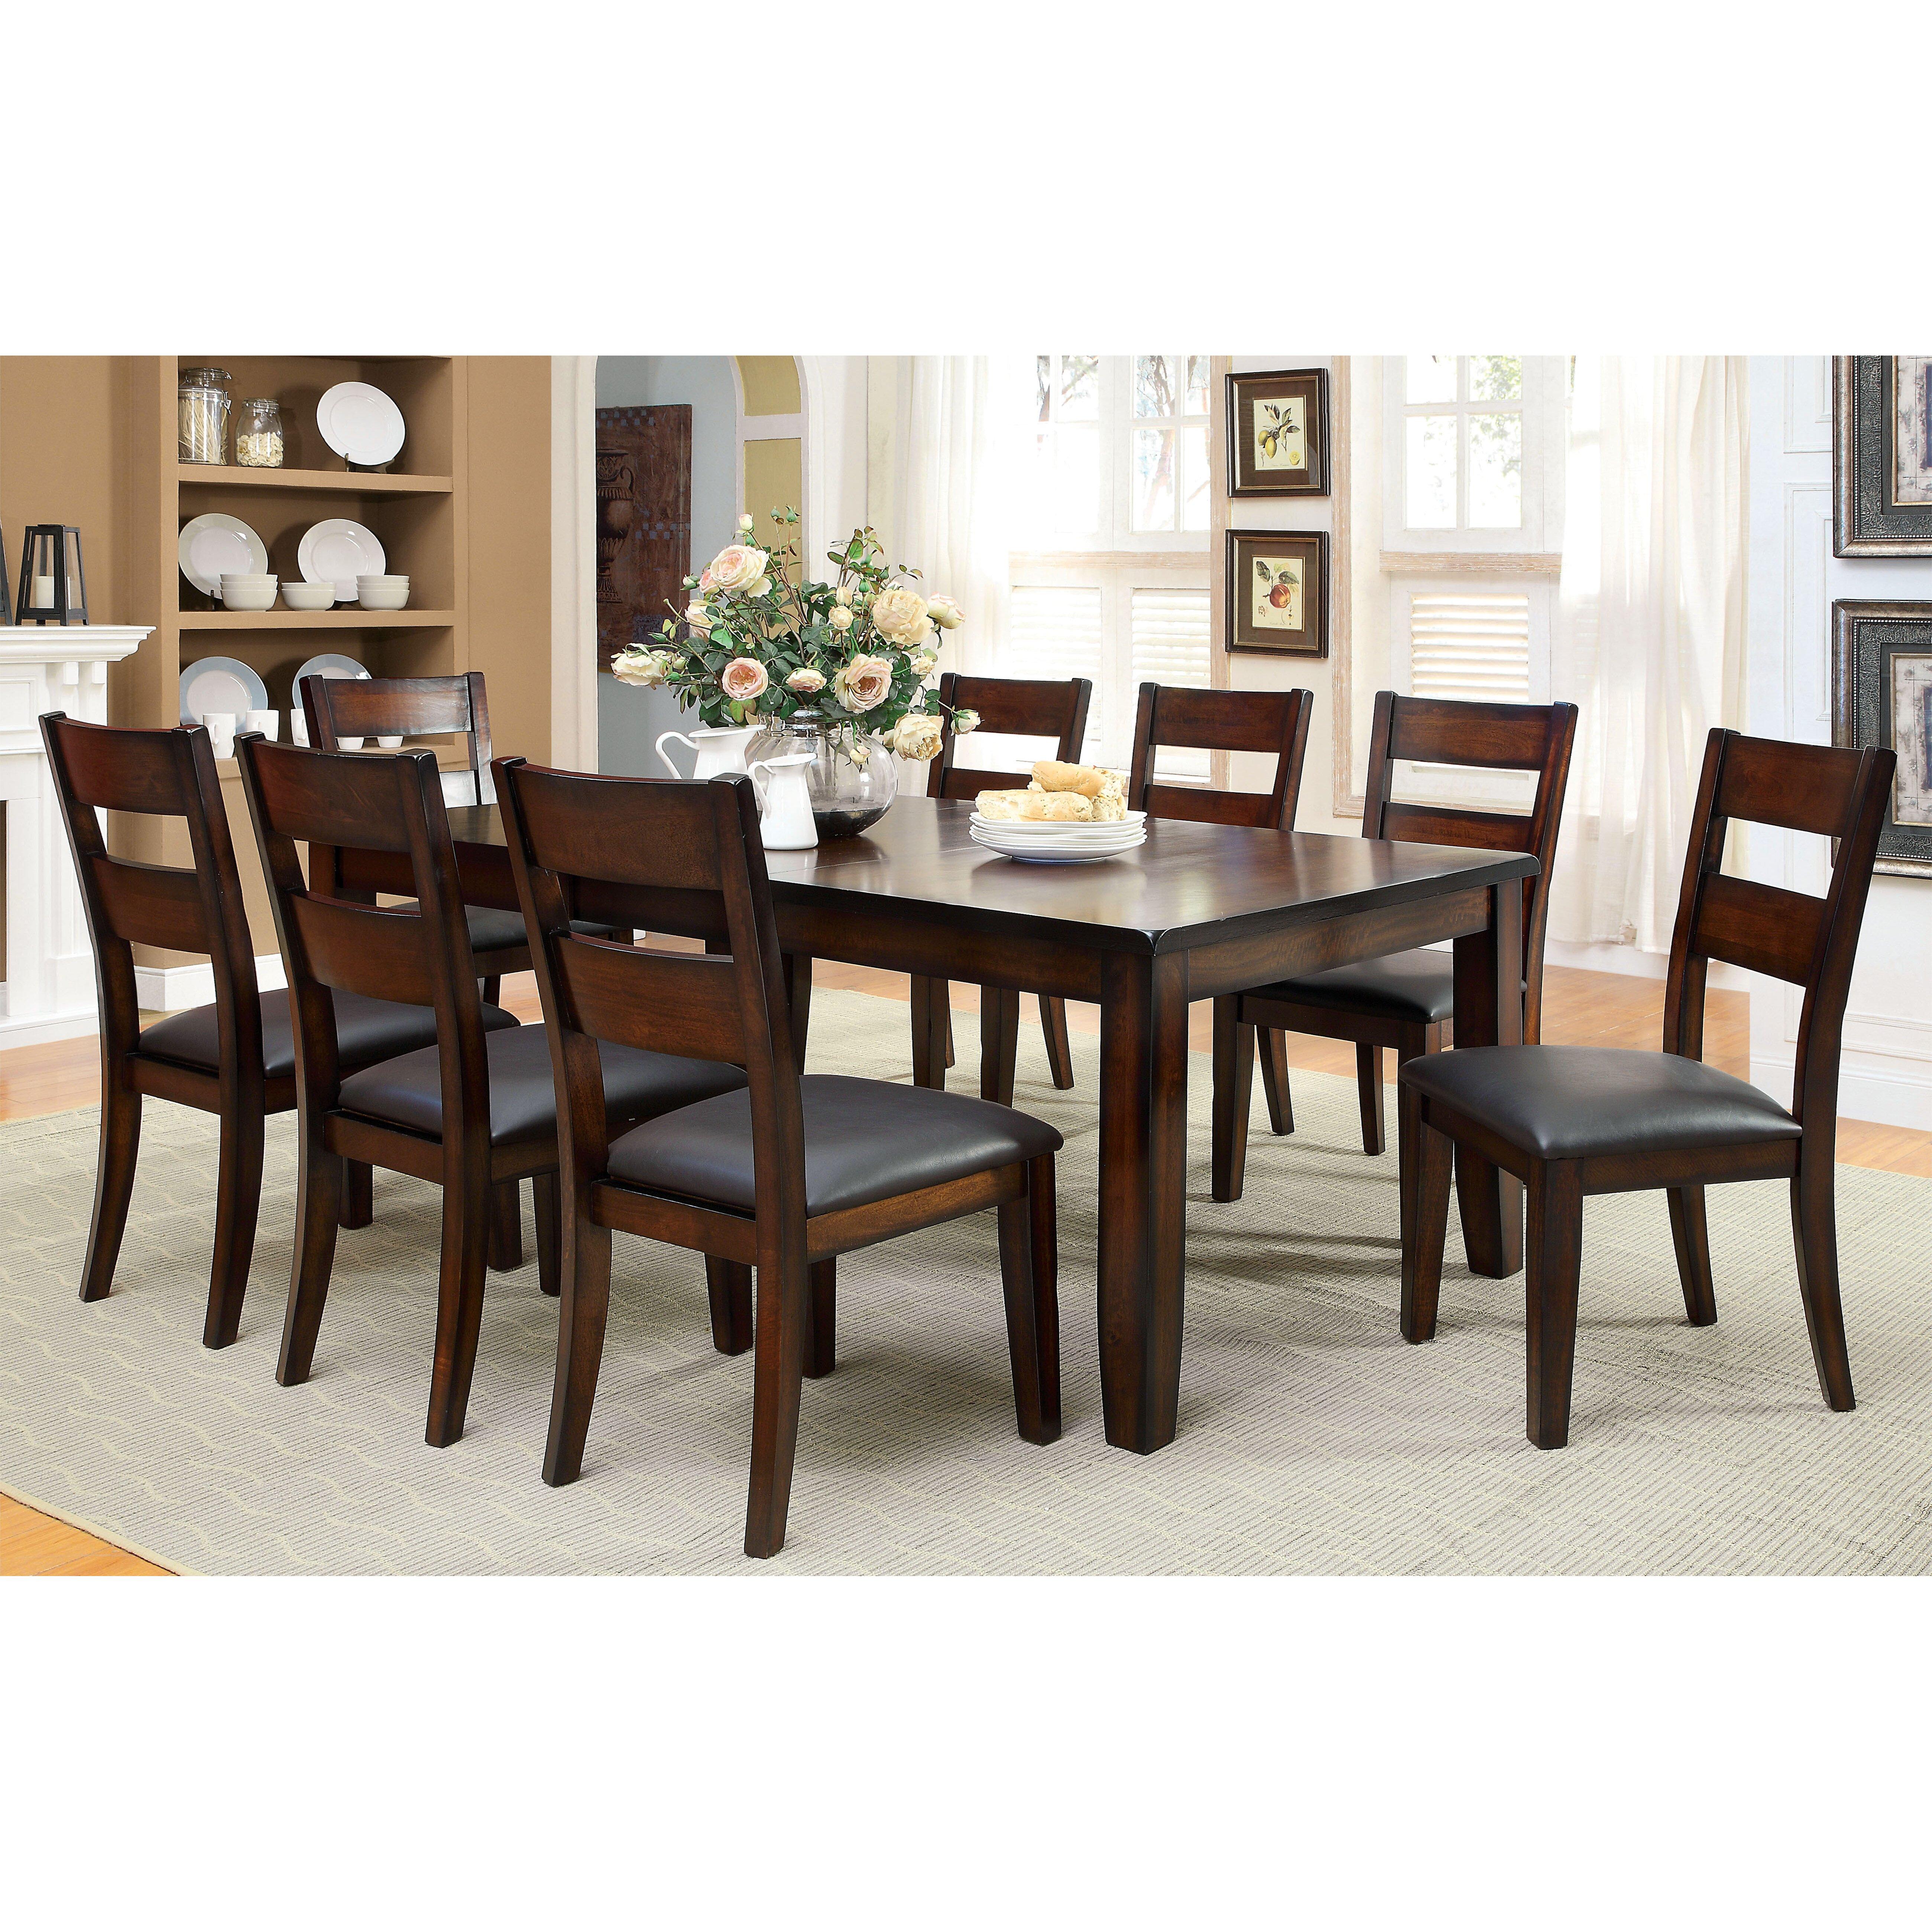 Hokku designs delayne 9 piece dining set reviews wayfair for Hokku designs dining room furniture